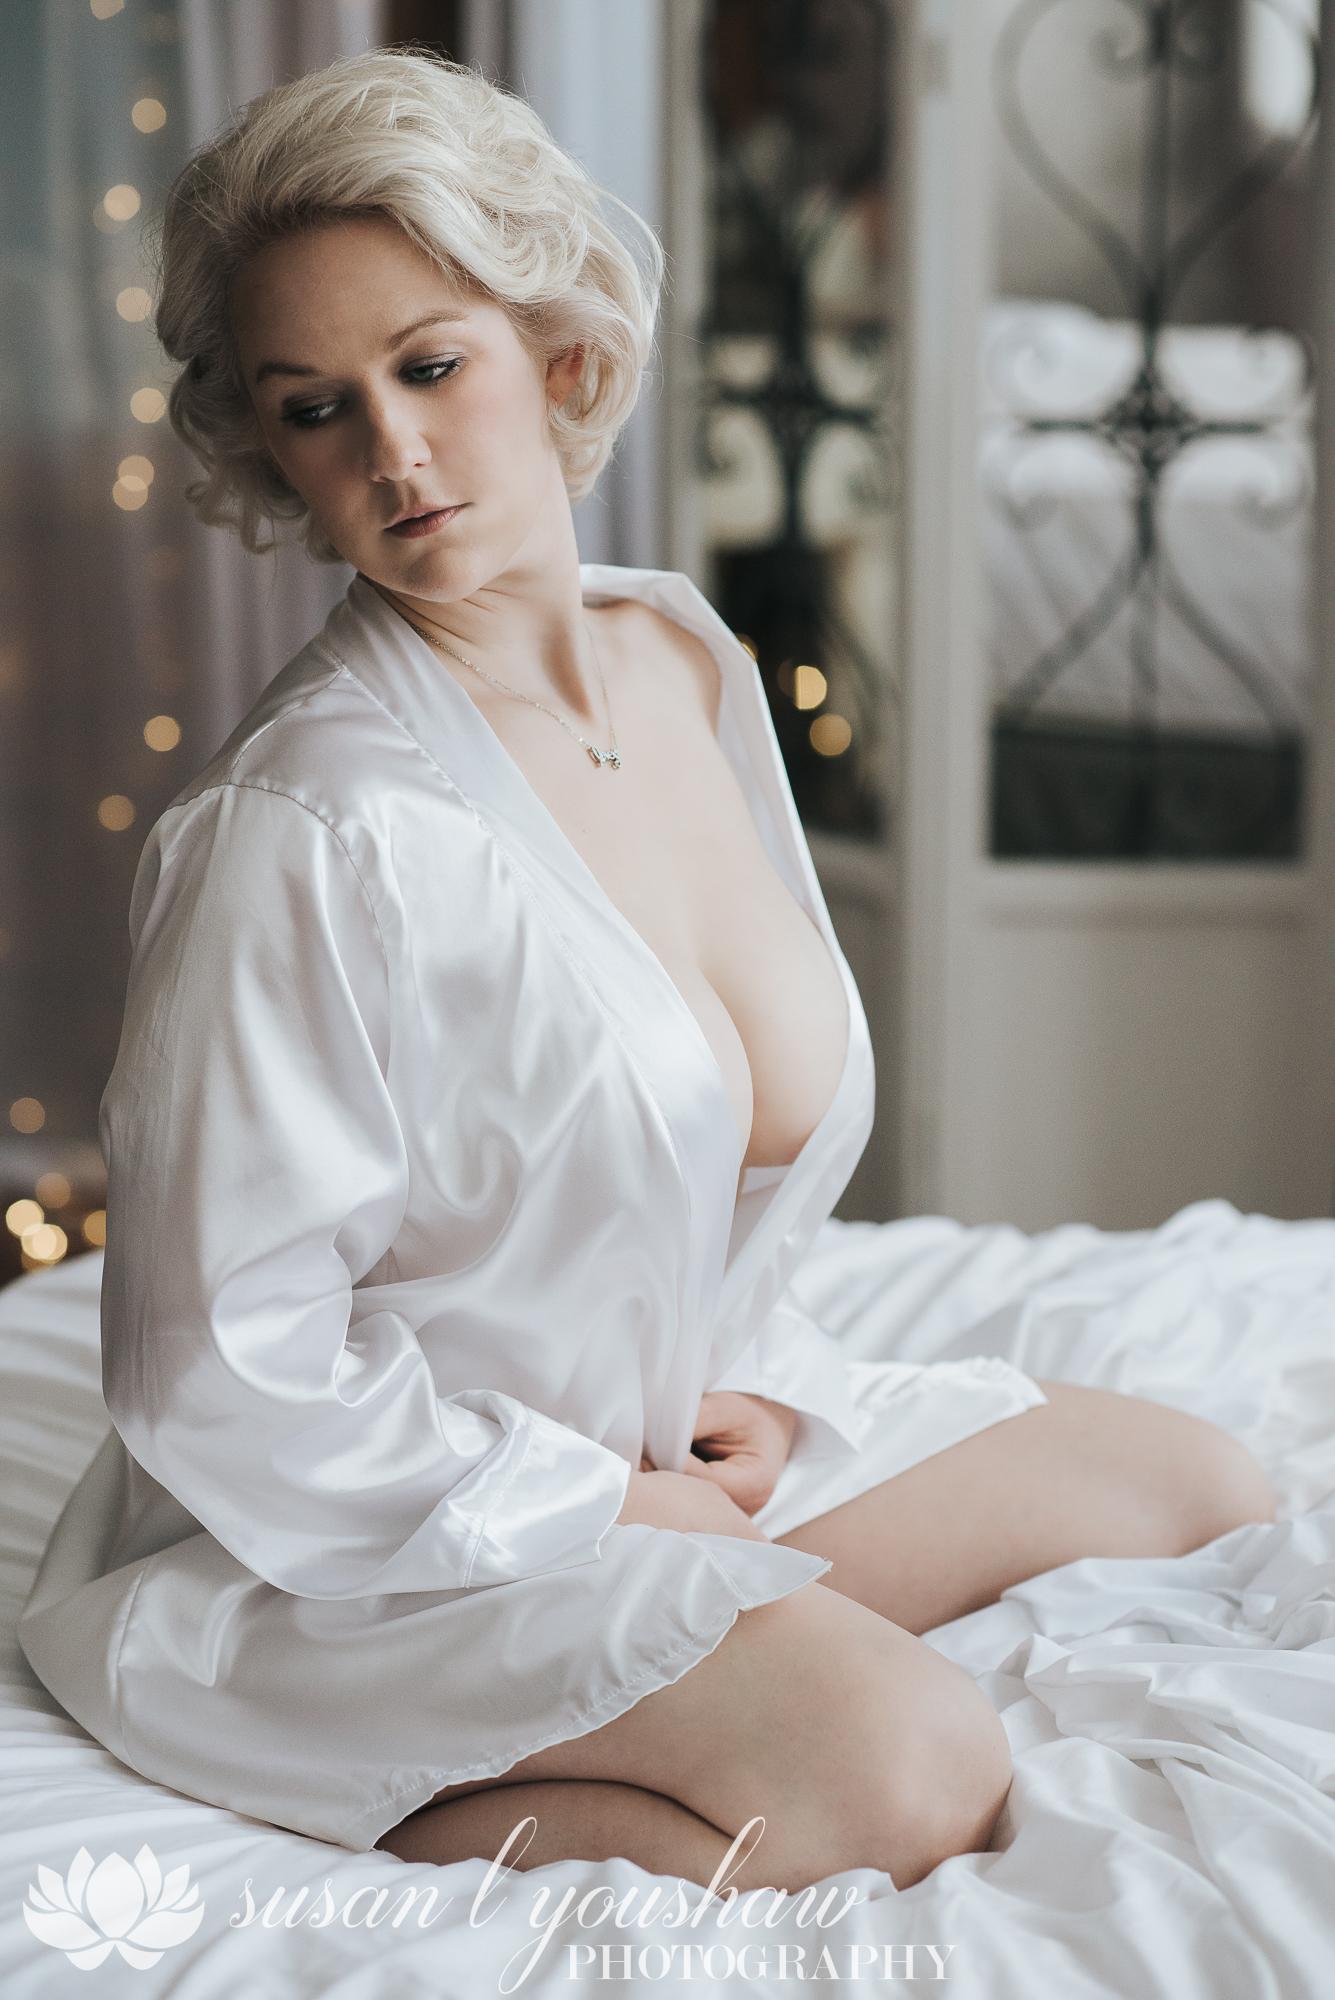 BLOG Christiane Mock 06-26-2018 SLY Photography LLC-7.jpg